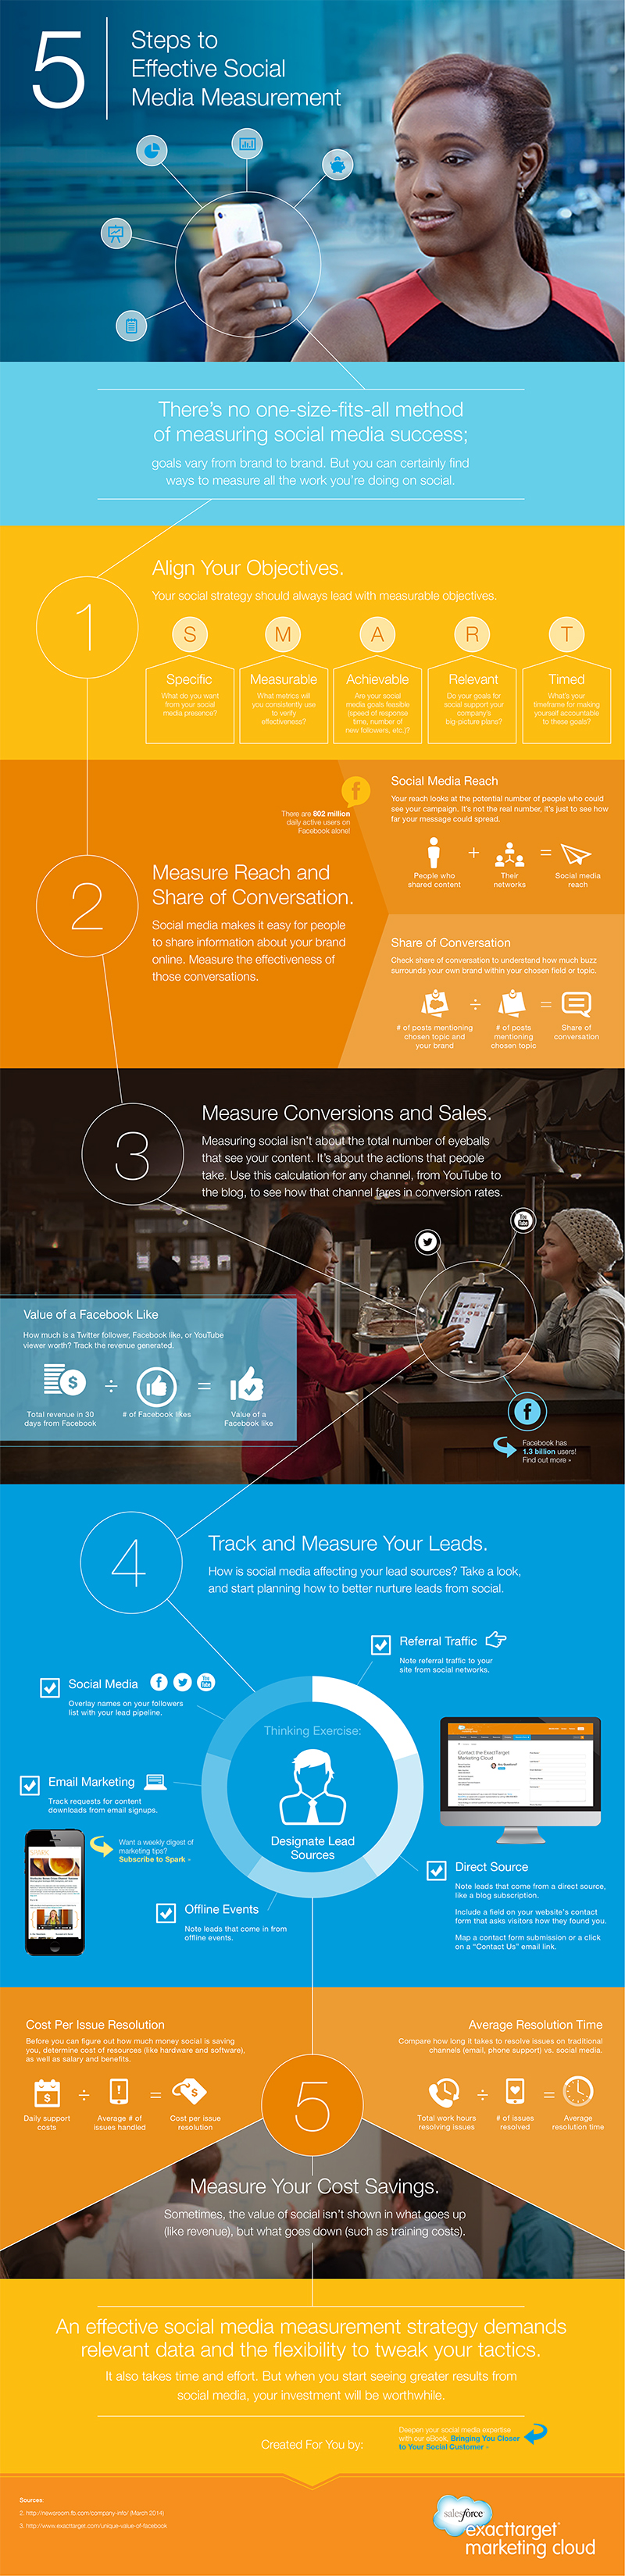 Infographic outlines key social media marketing measurement tips